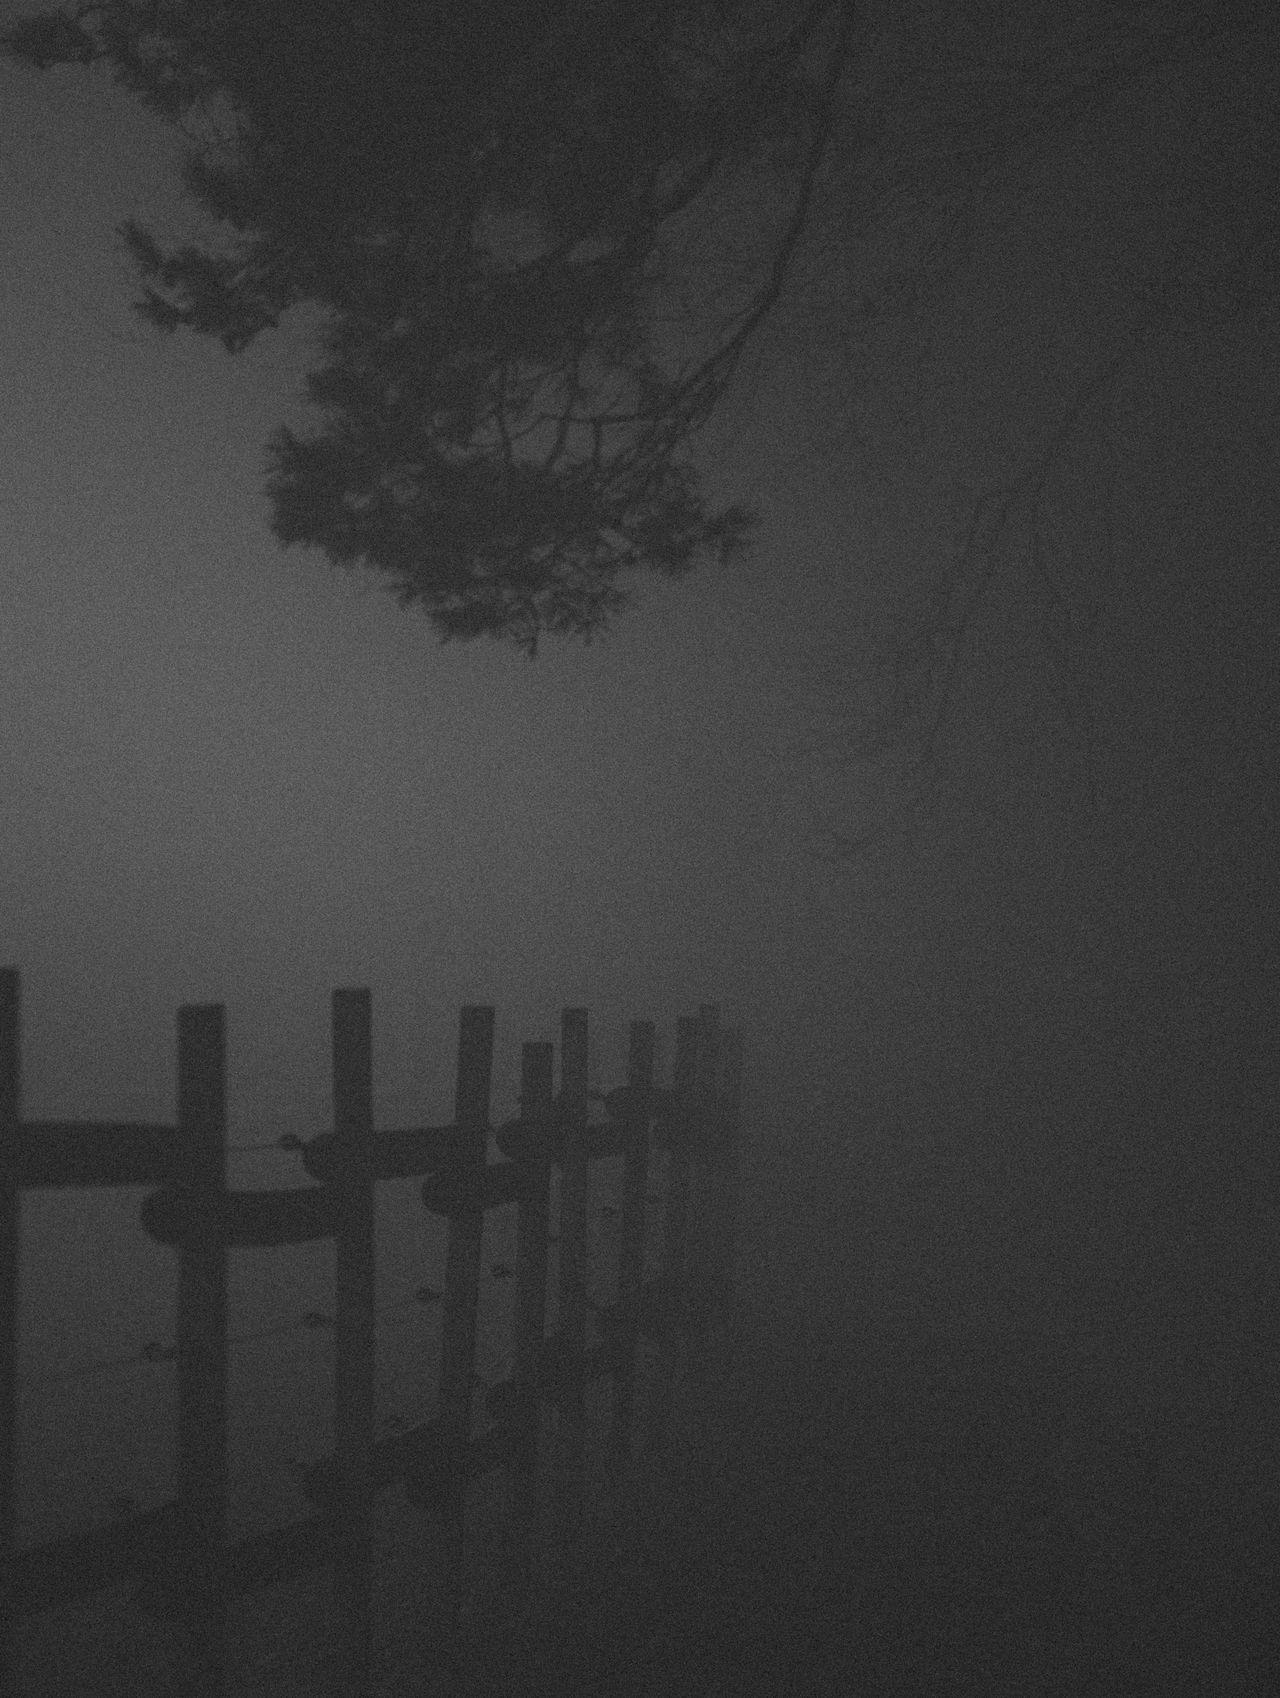 Black & White Black And White Black And White Photography Branch Countryside Dark Dark Photography Darkness Fence Fog Foggy Grass Hazy  Memorial Minimal Minimalism Minimalobsession Mist Nature Night Photography Night View Nightshot Outdoors Rural Tree